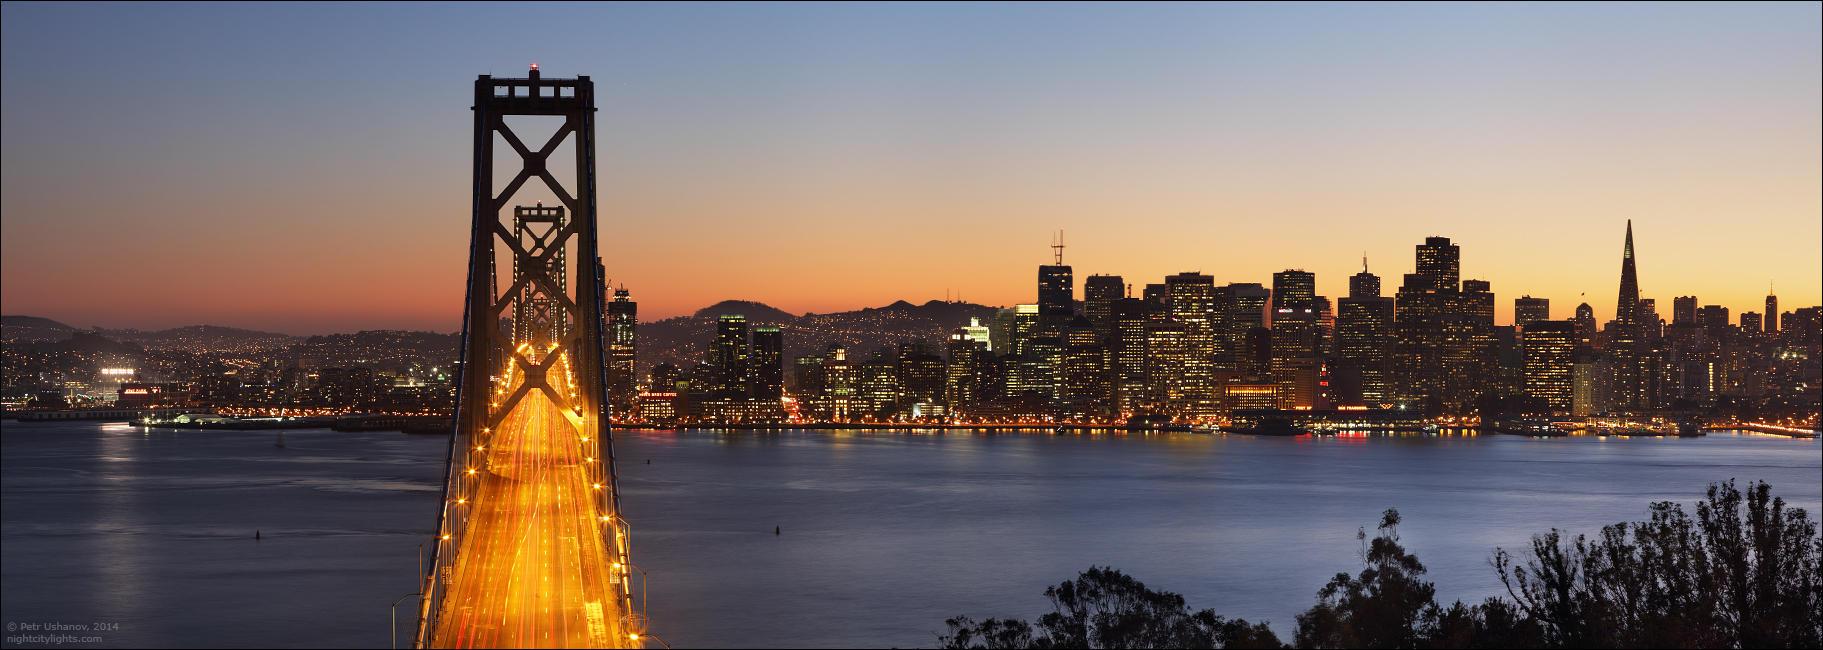 SFpanorama03 Сан Франциско   панорамы города